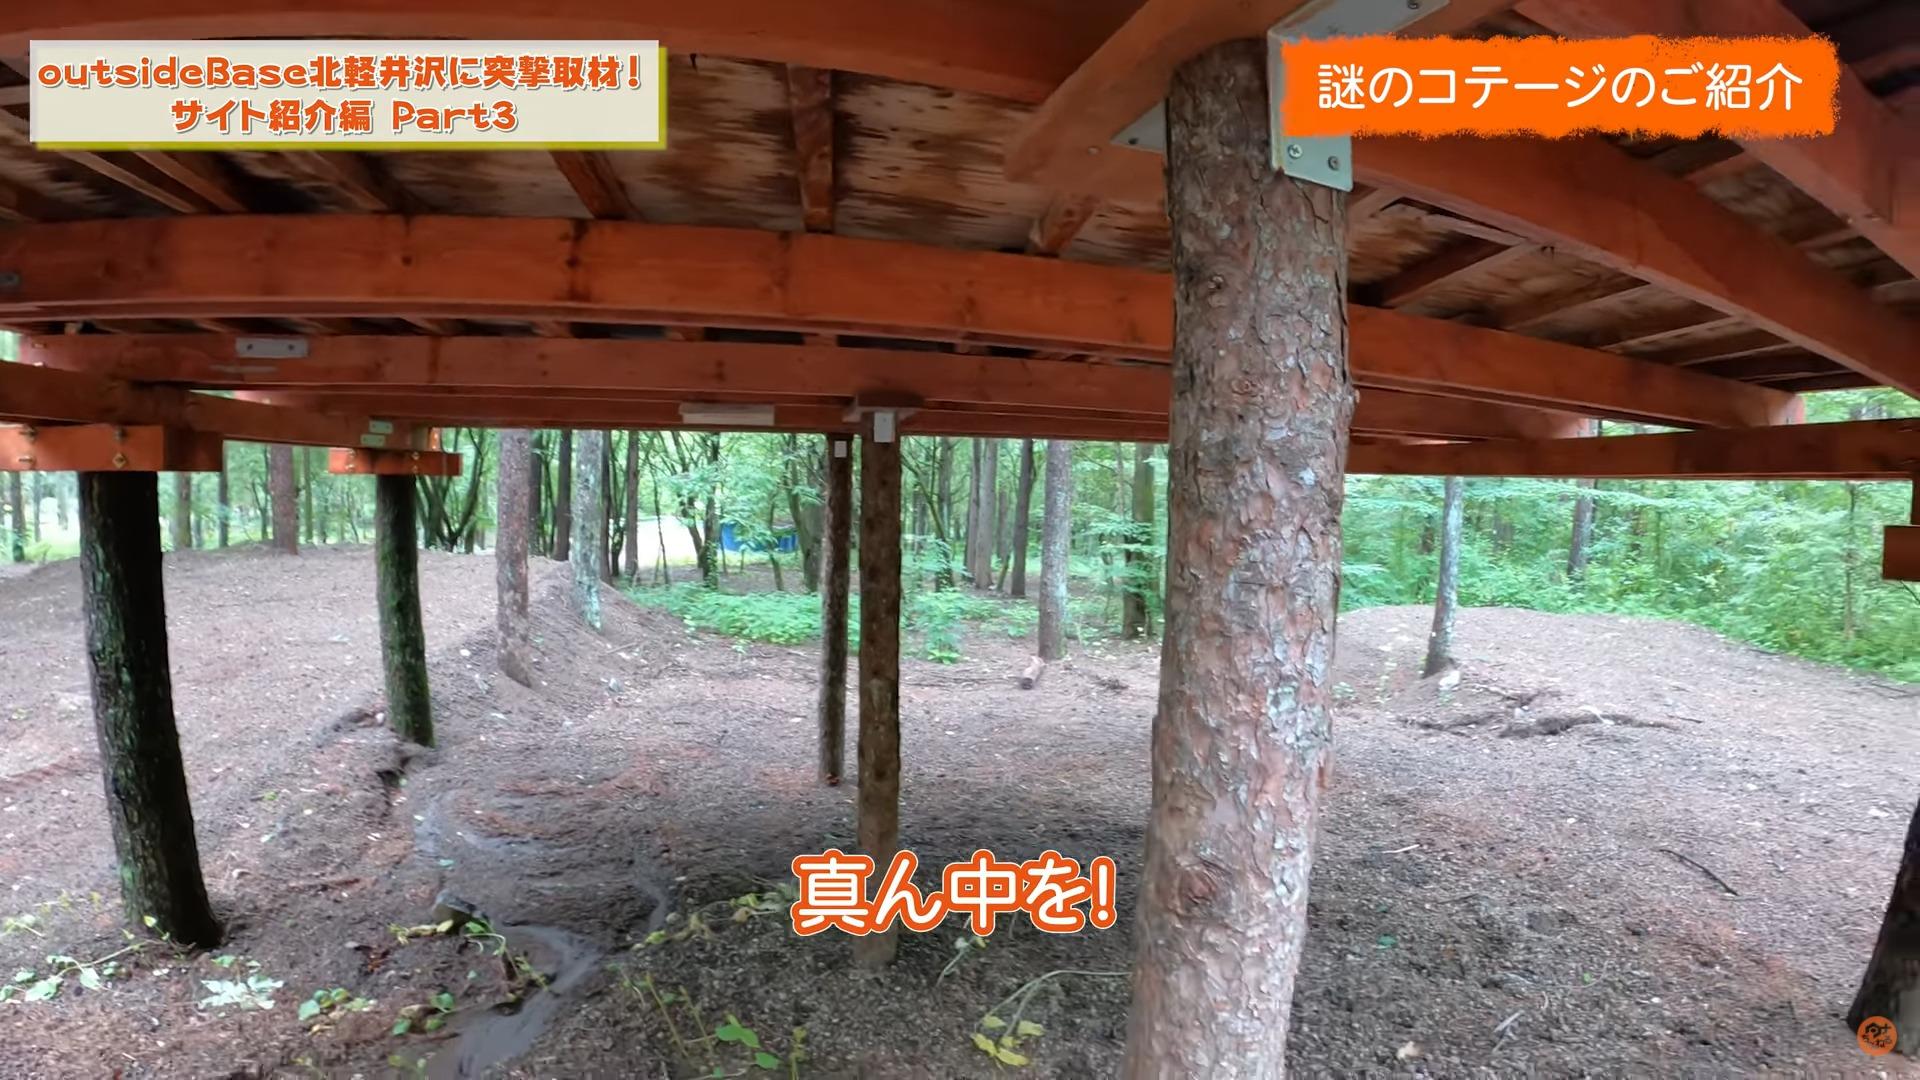 【outsidebase北軽井沢】 コテージ